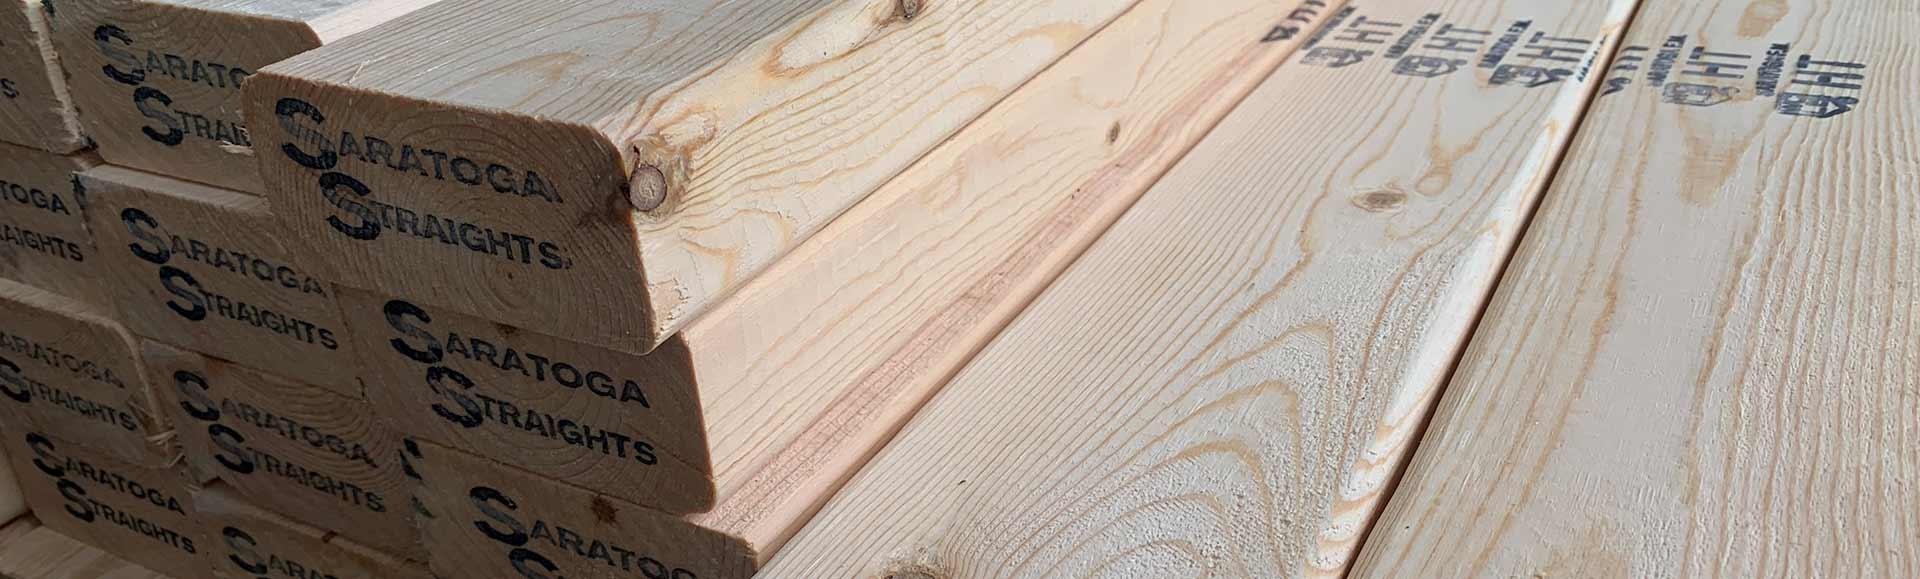 Traverse City Lumber Yard, Decking and Windows and Doors